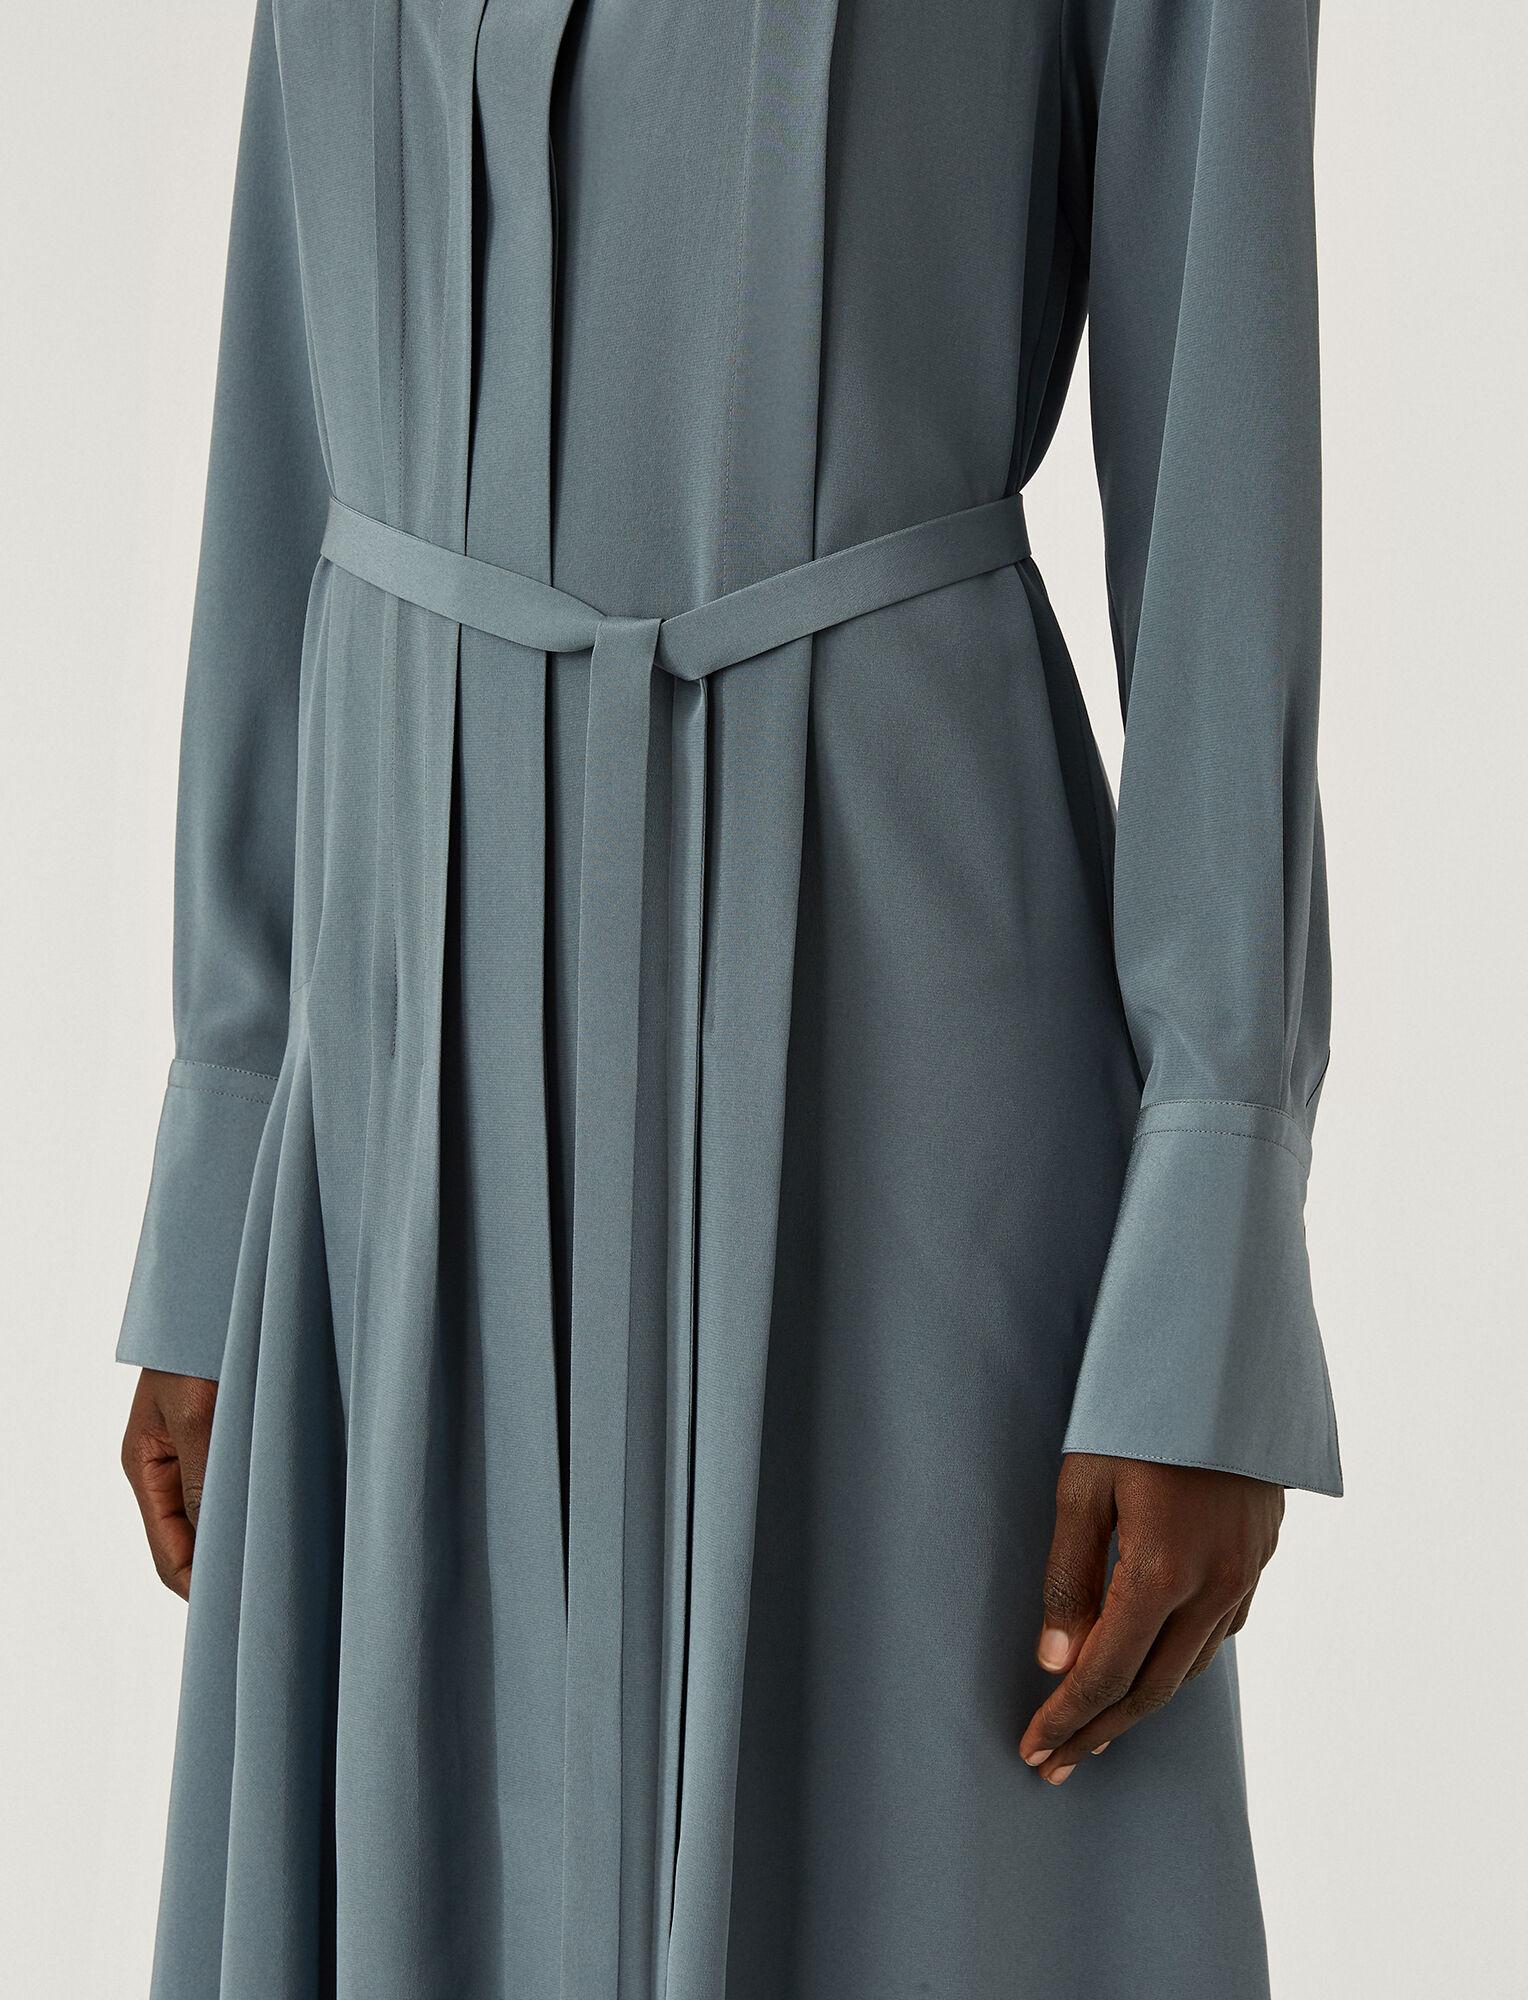 Joseph, New Crepe de Chine Despente Dress, in BLUE STEEL